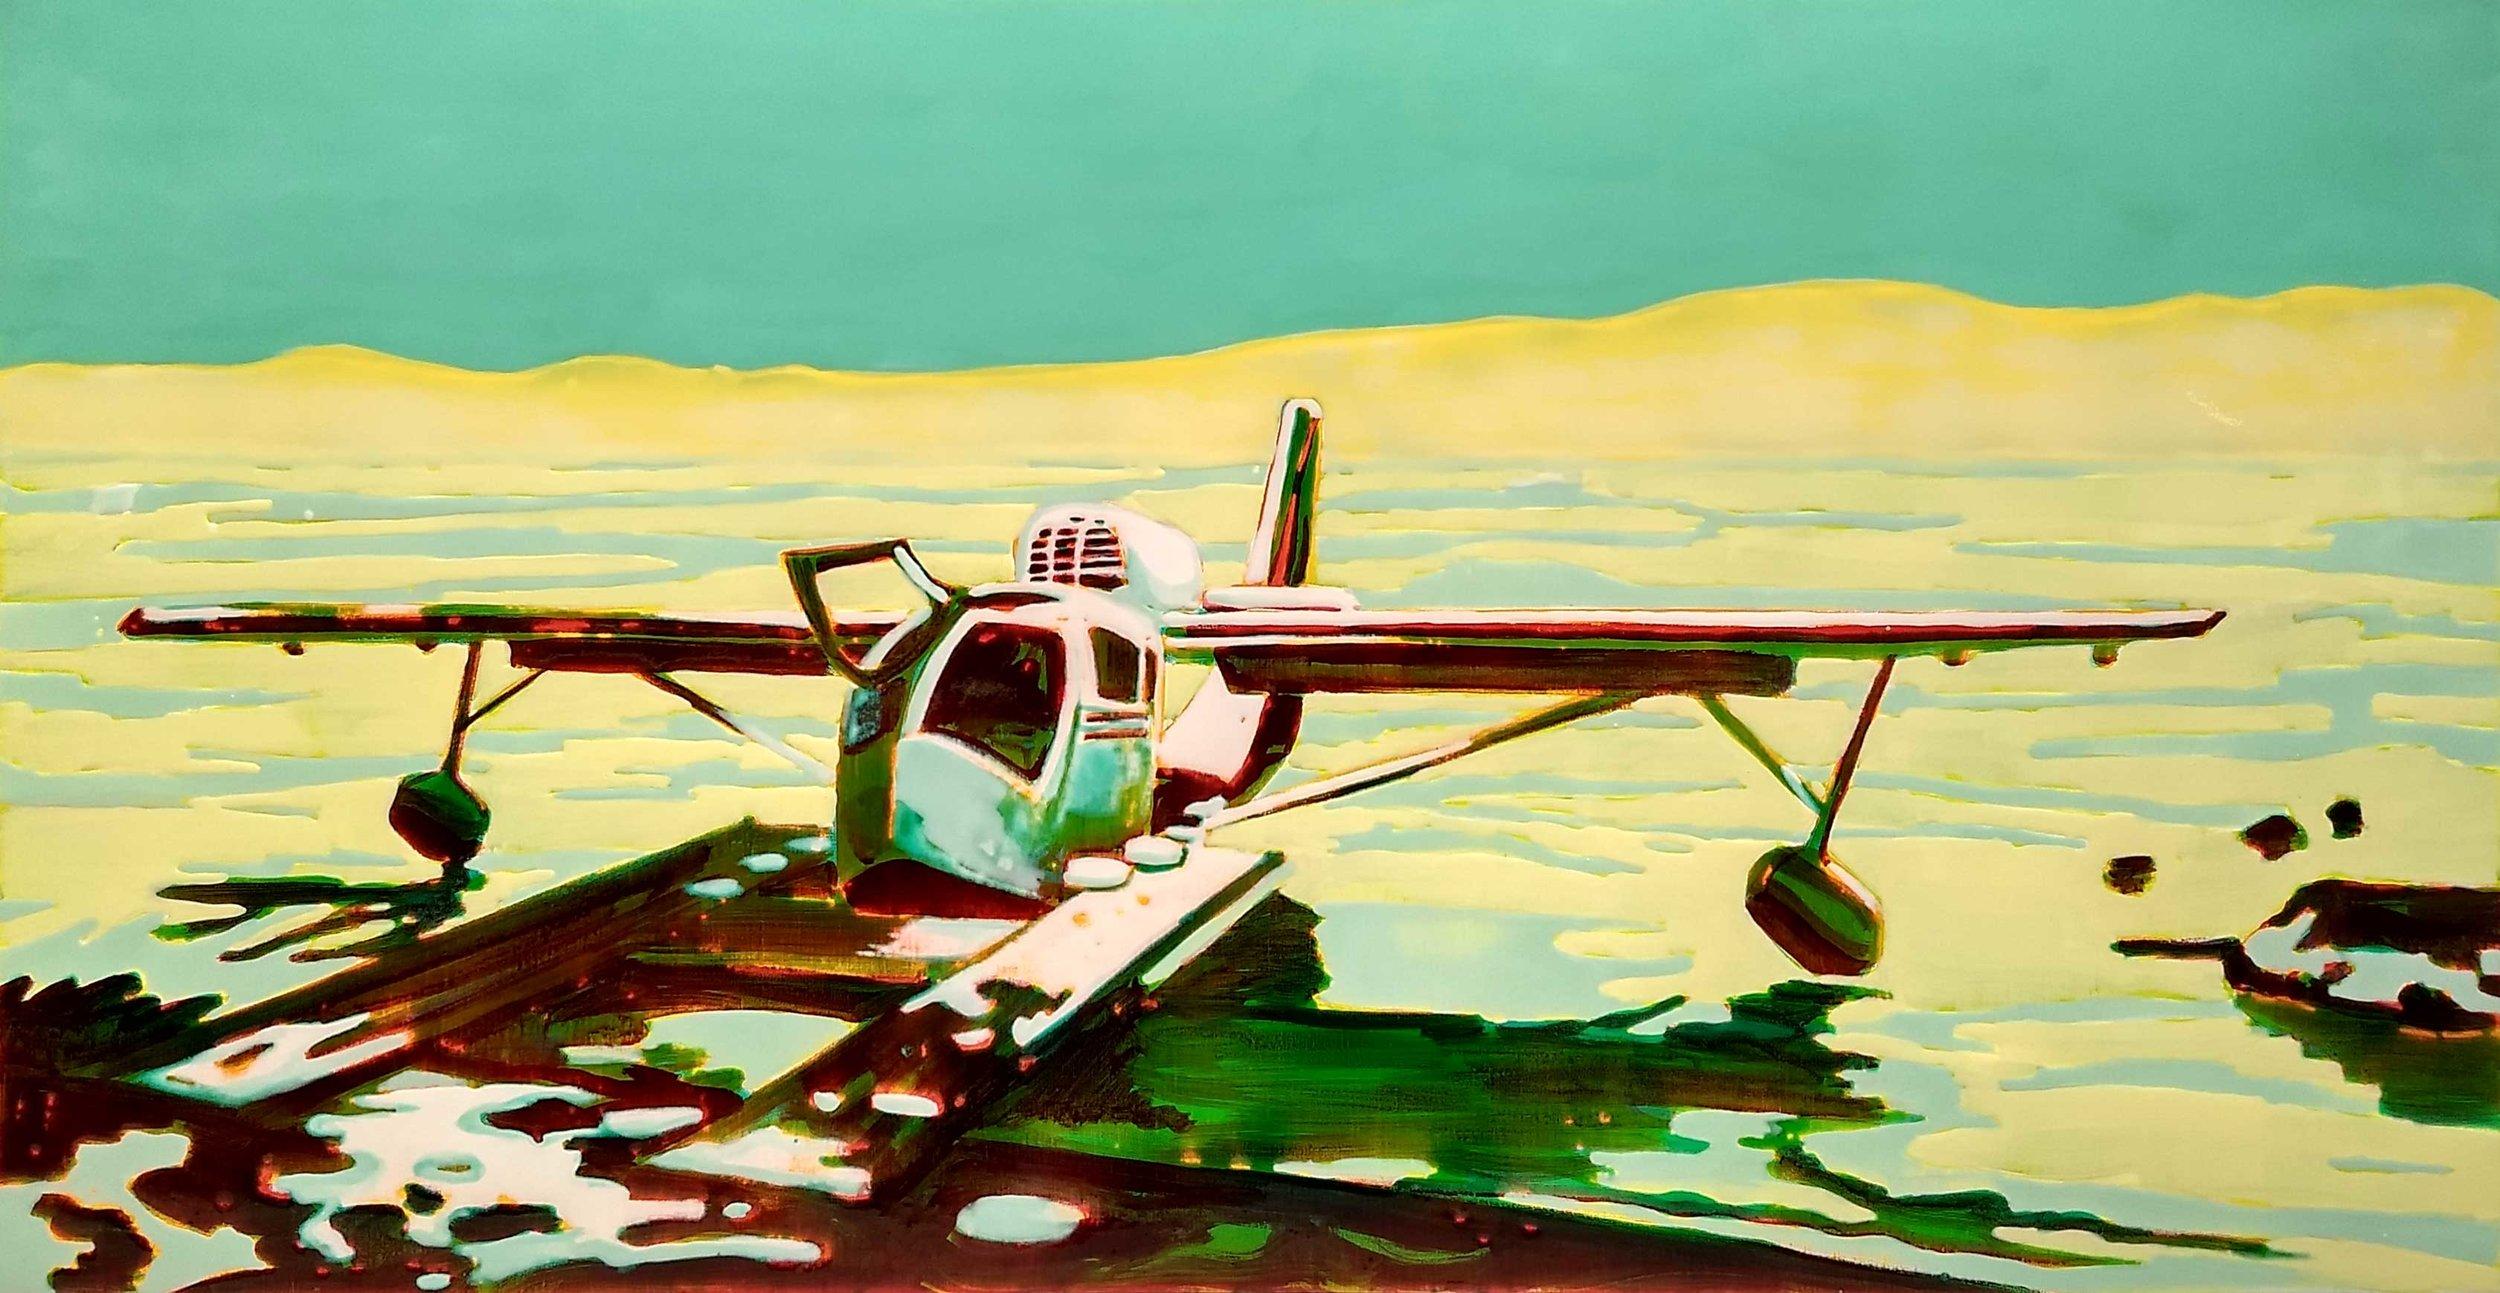 SEAPLANE ON LAKE TAHOE  70x140 cm acrylic and epoxy on canvas